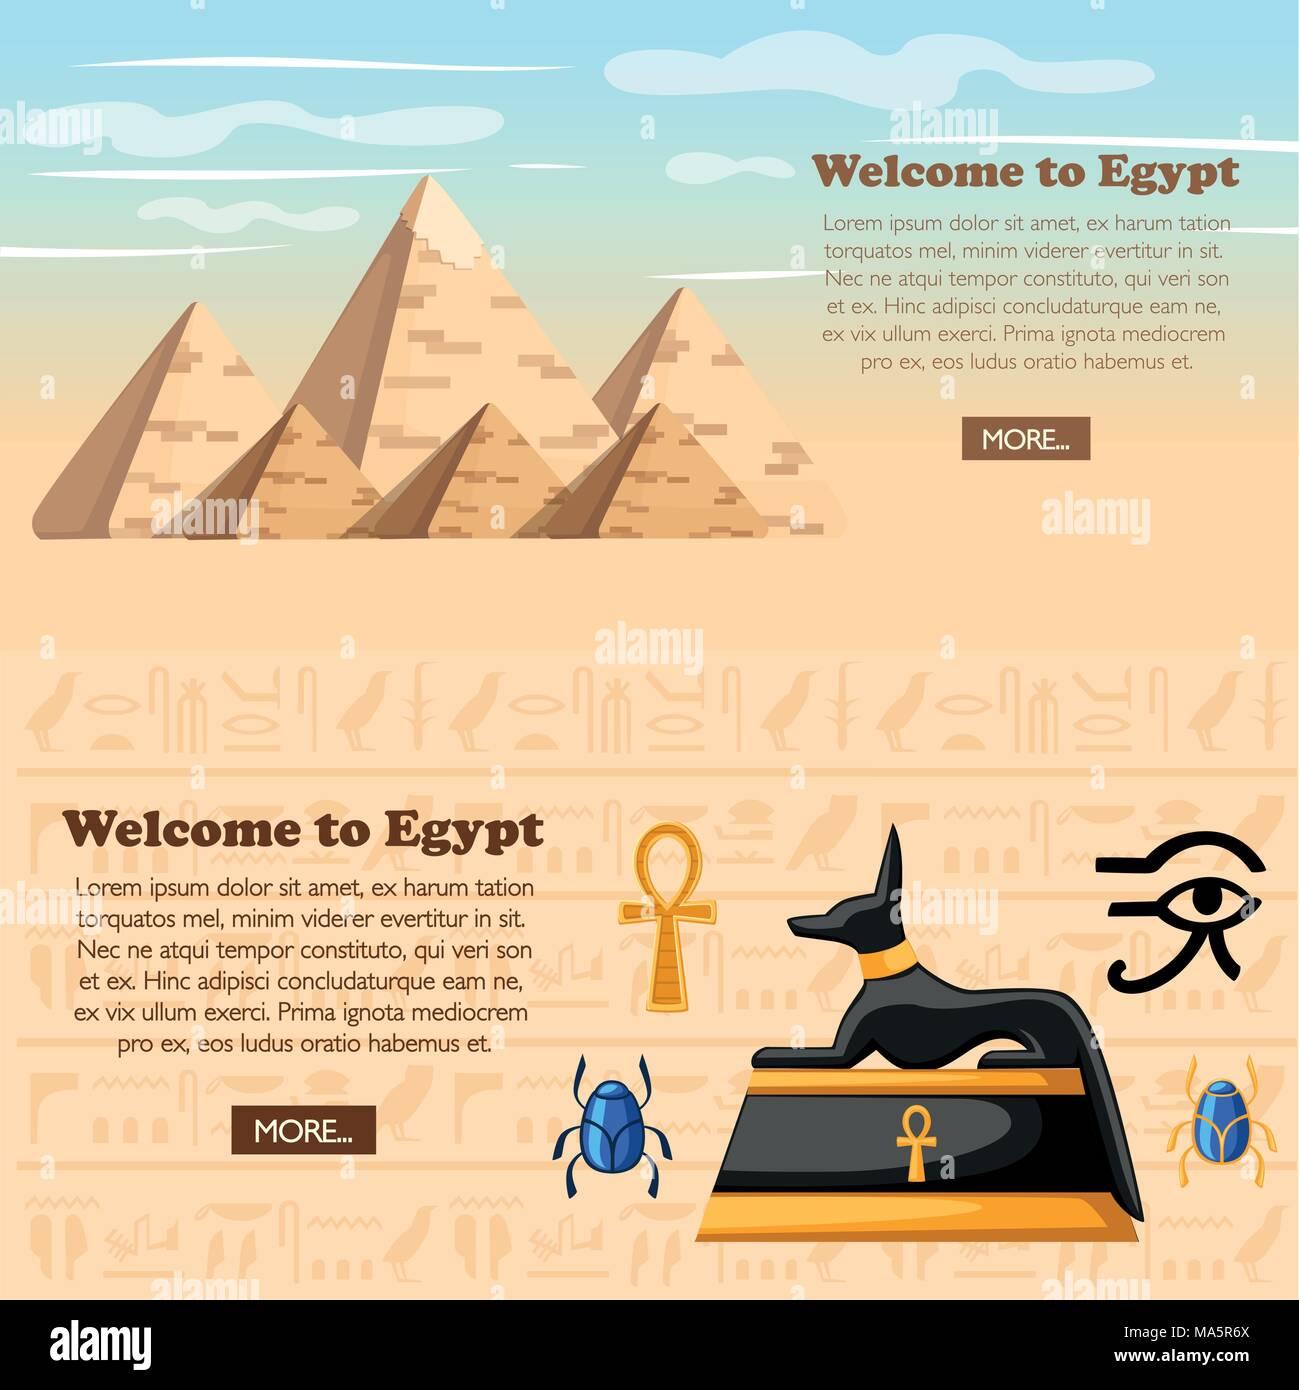 Egyptian Mummy And Pyramid Stock Photos Amp Egyptian Mummy